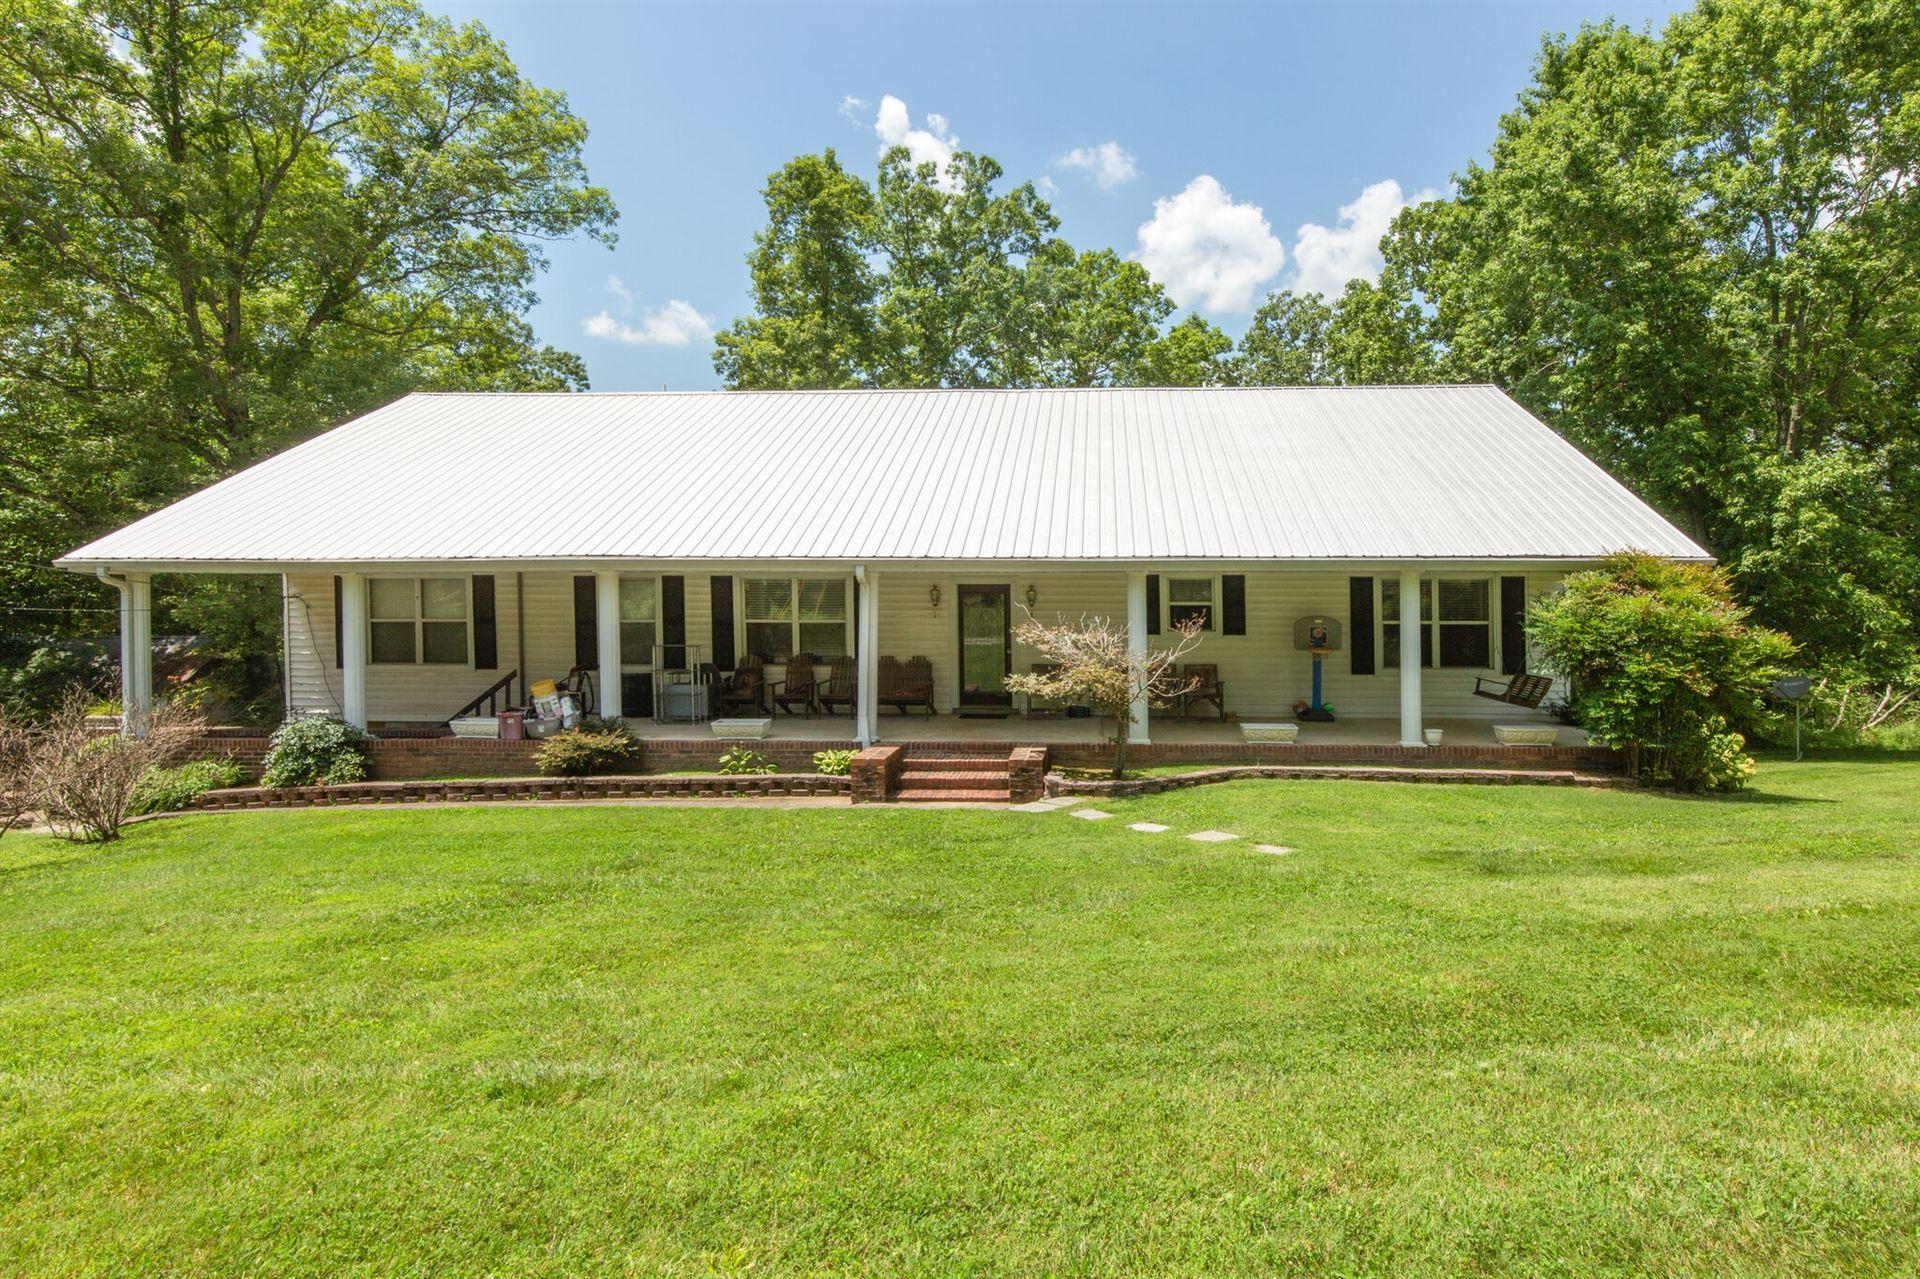 7206 Lake Rd, Fairview, TN 37062 - MLS#: 2275665